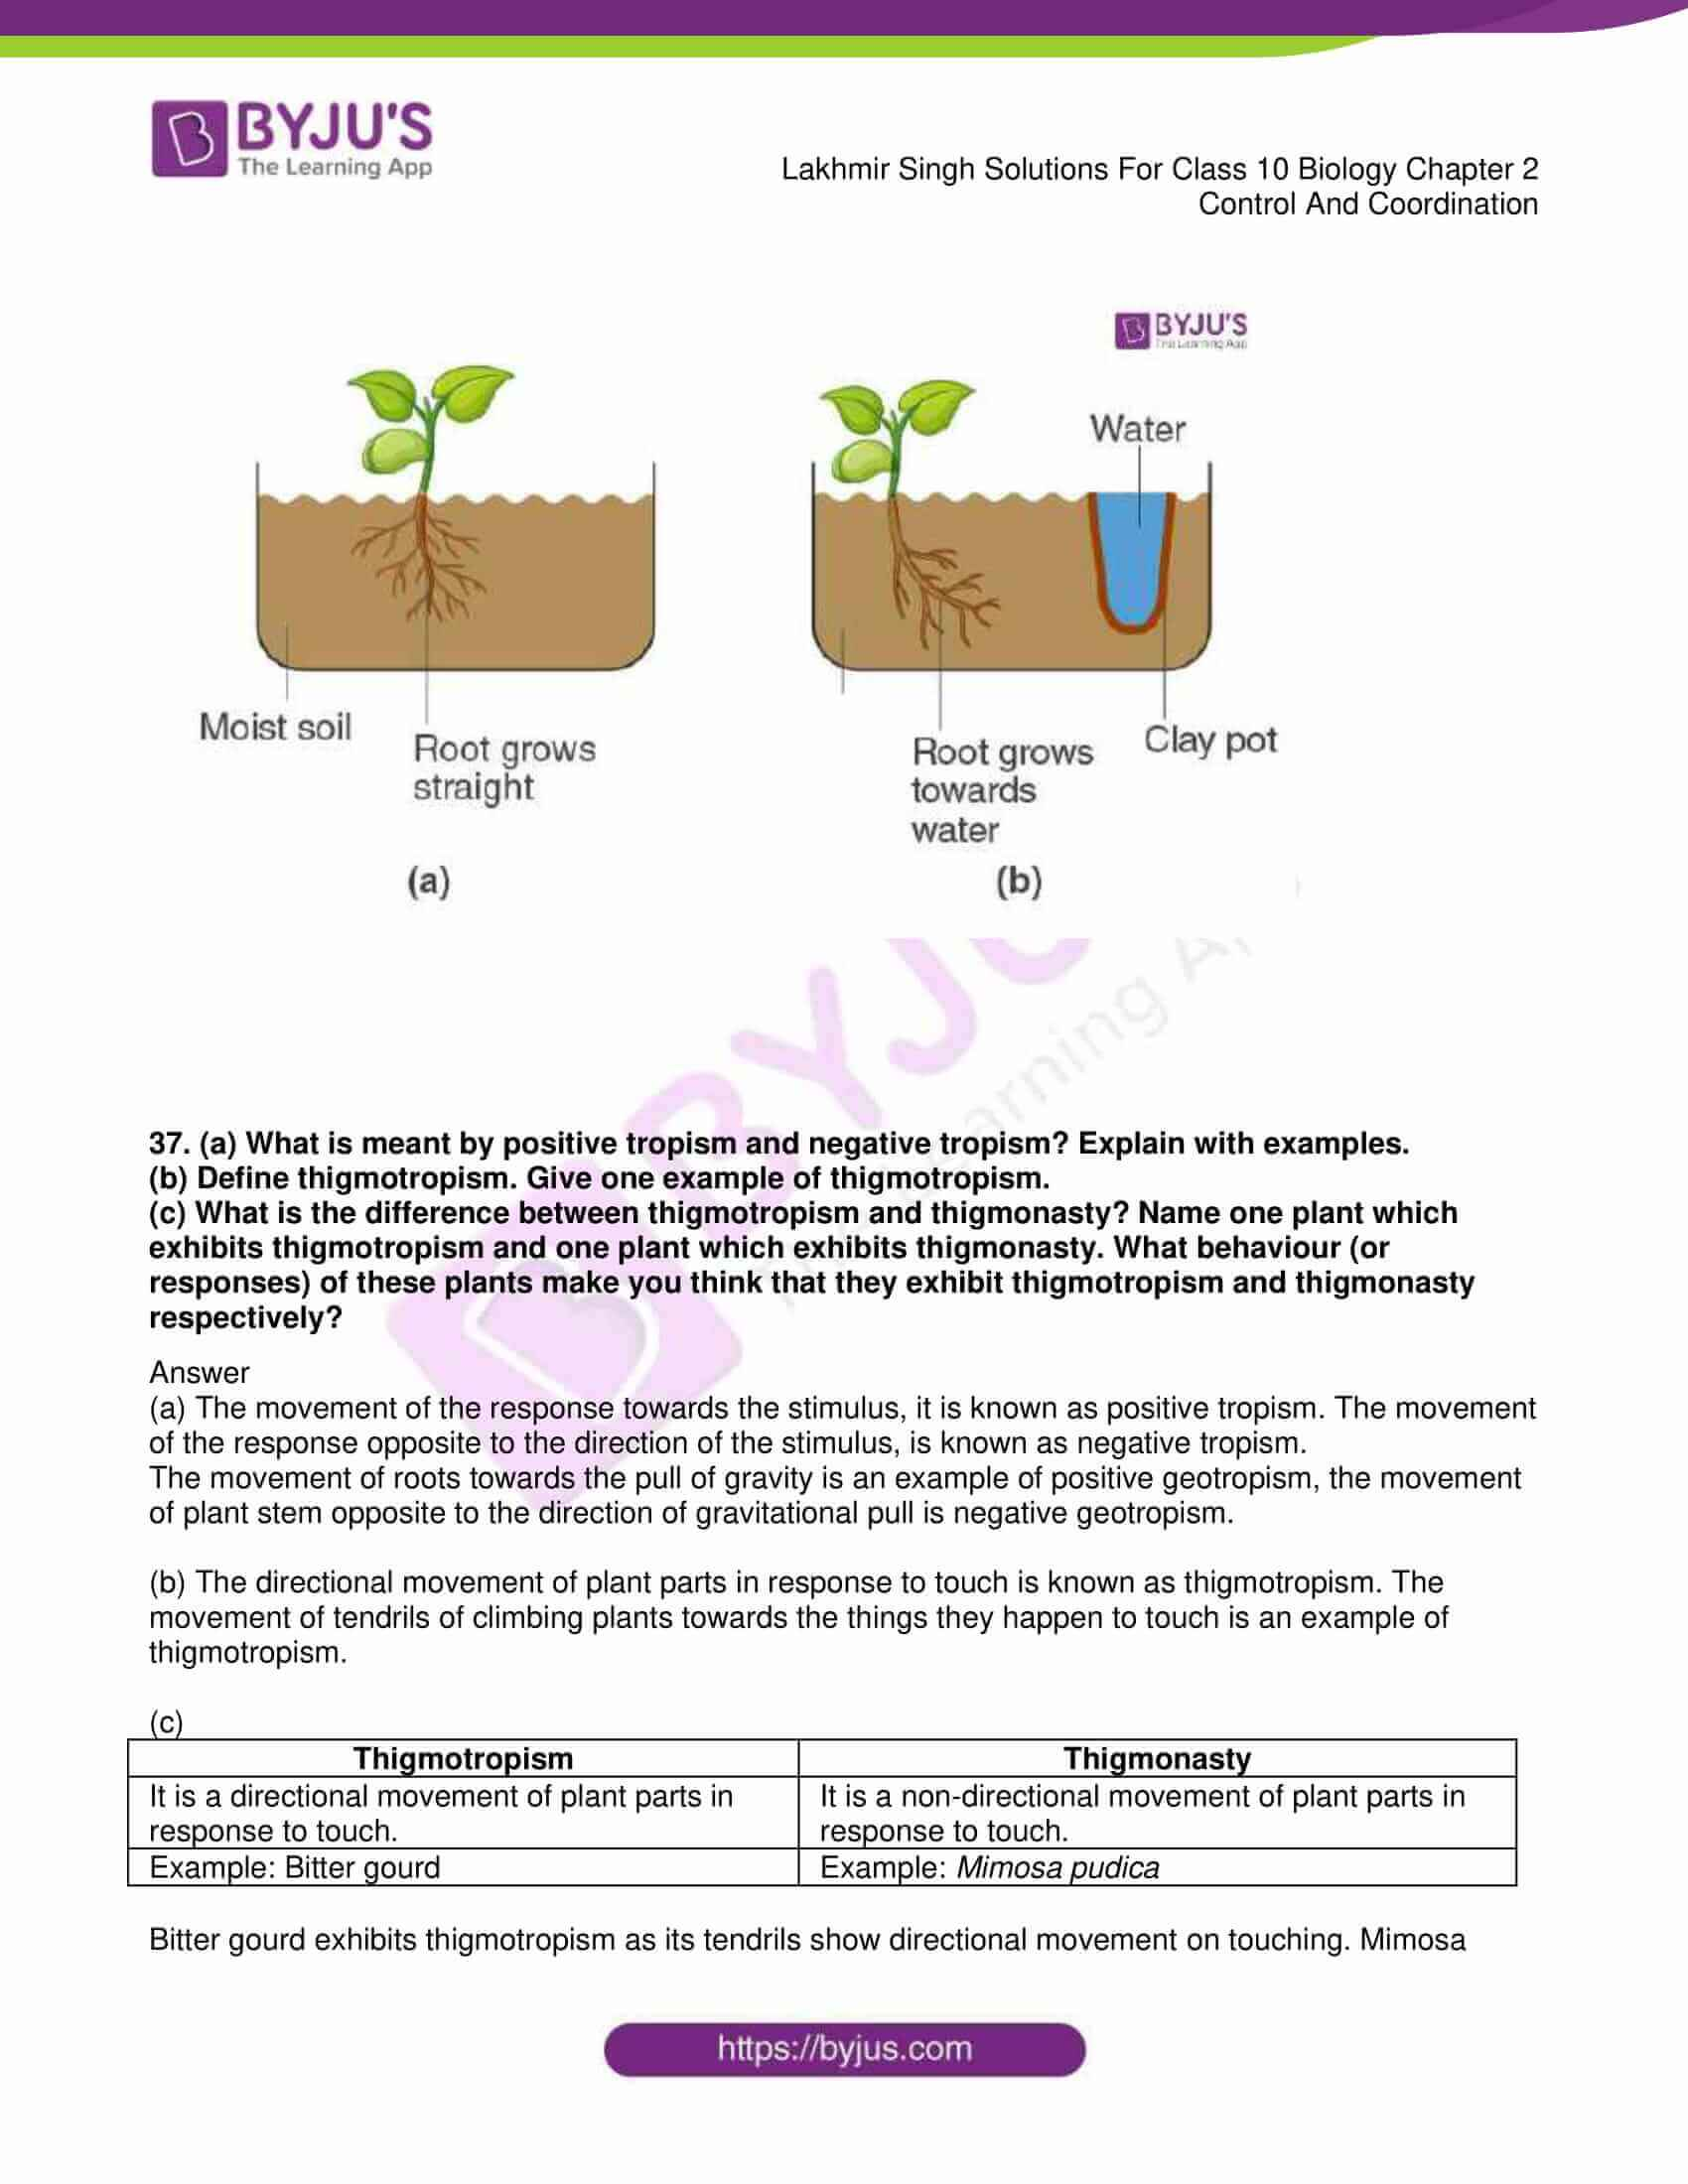 lakhmir singh sol class 10 biology chapter 2 13